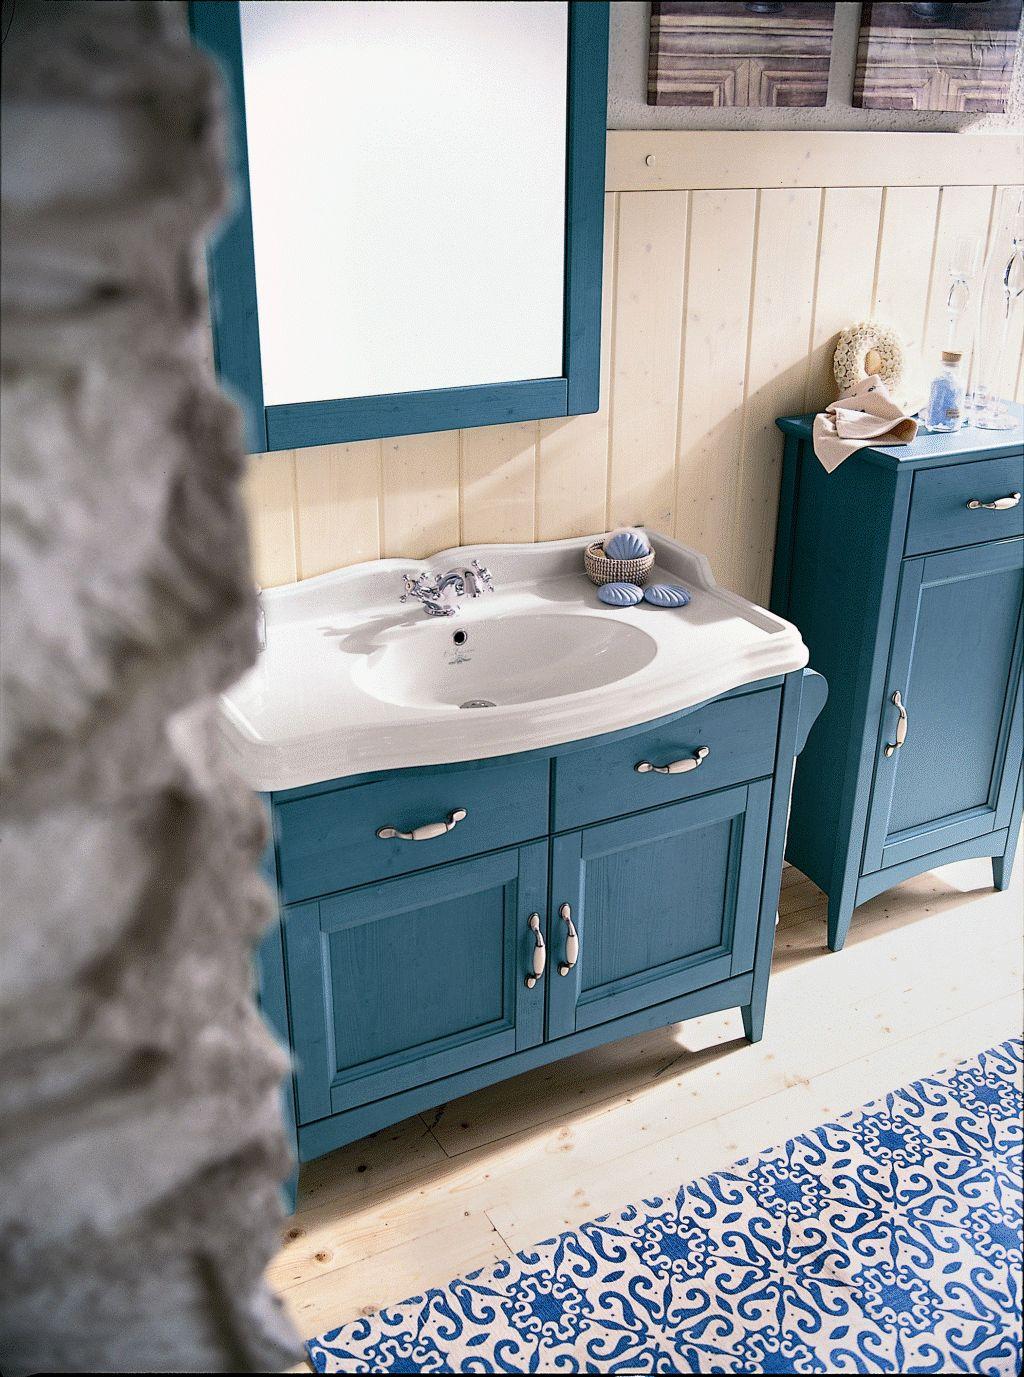 Badmobel Landhausstil Blau Raffiflorist Com